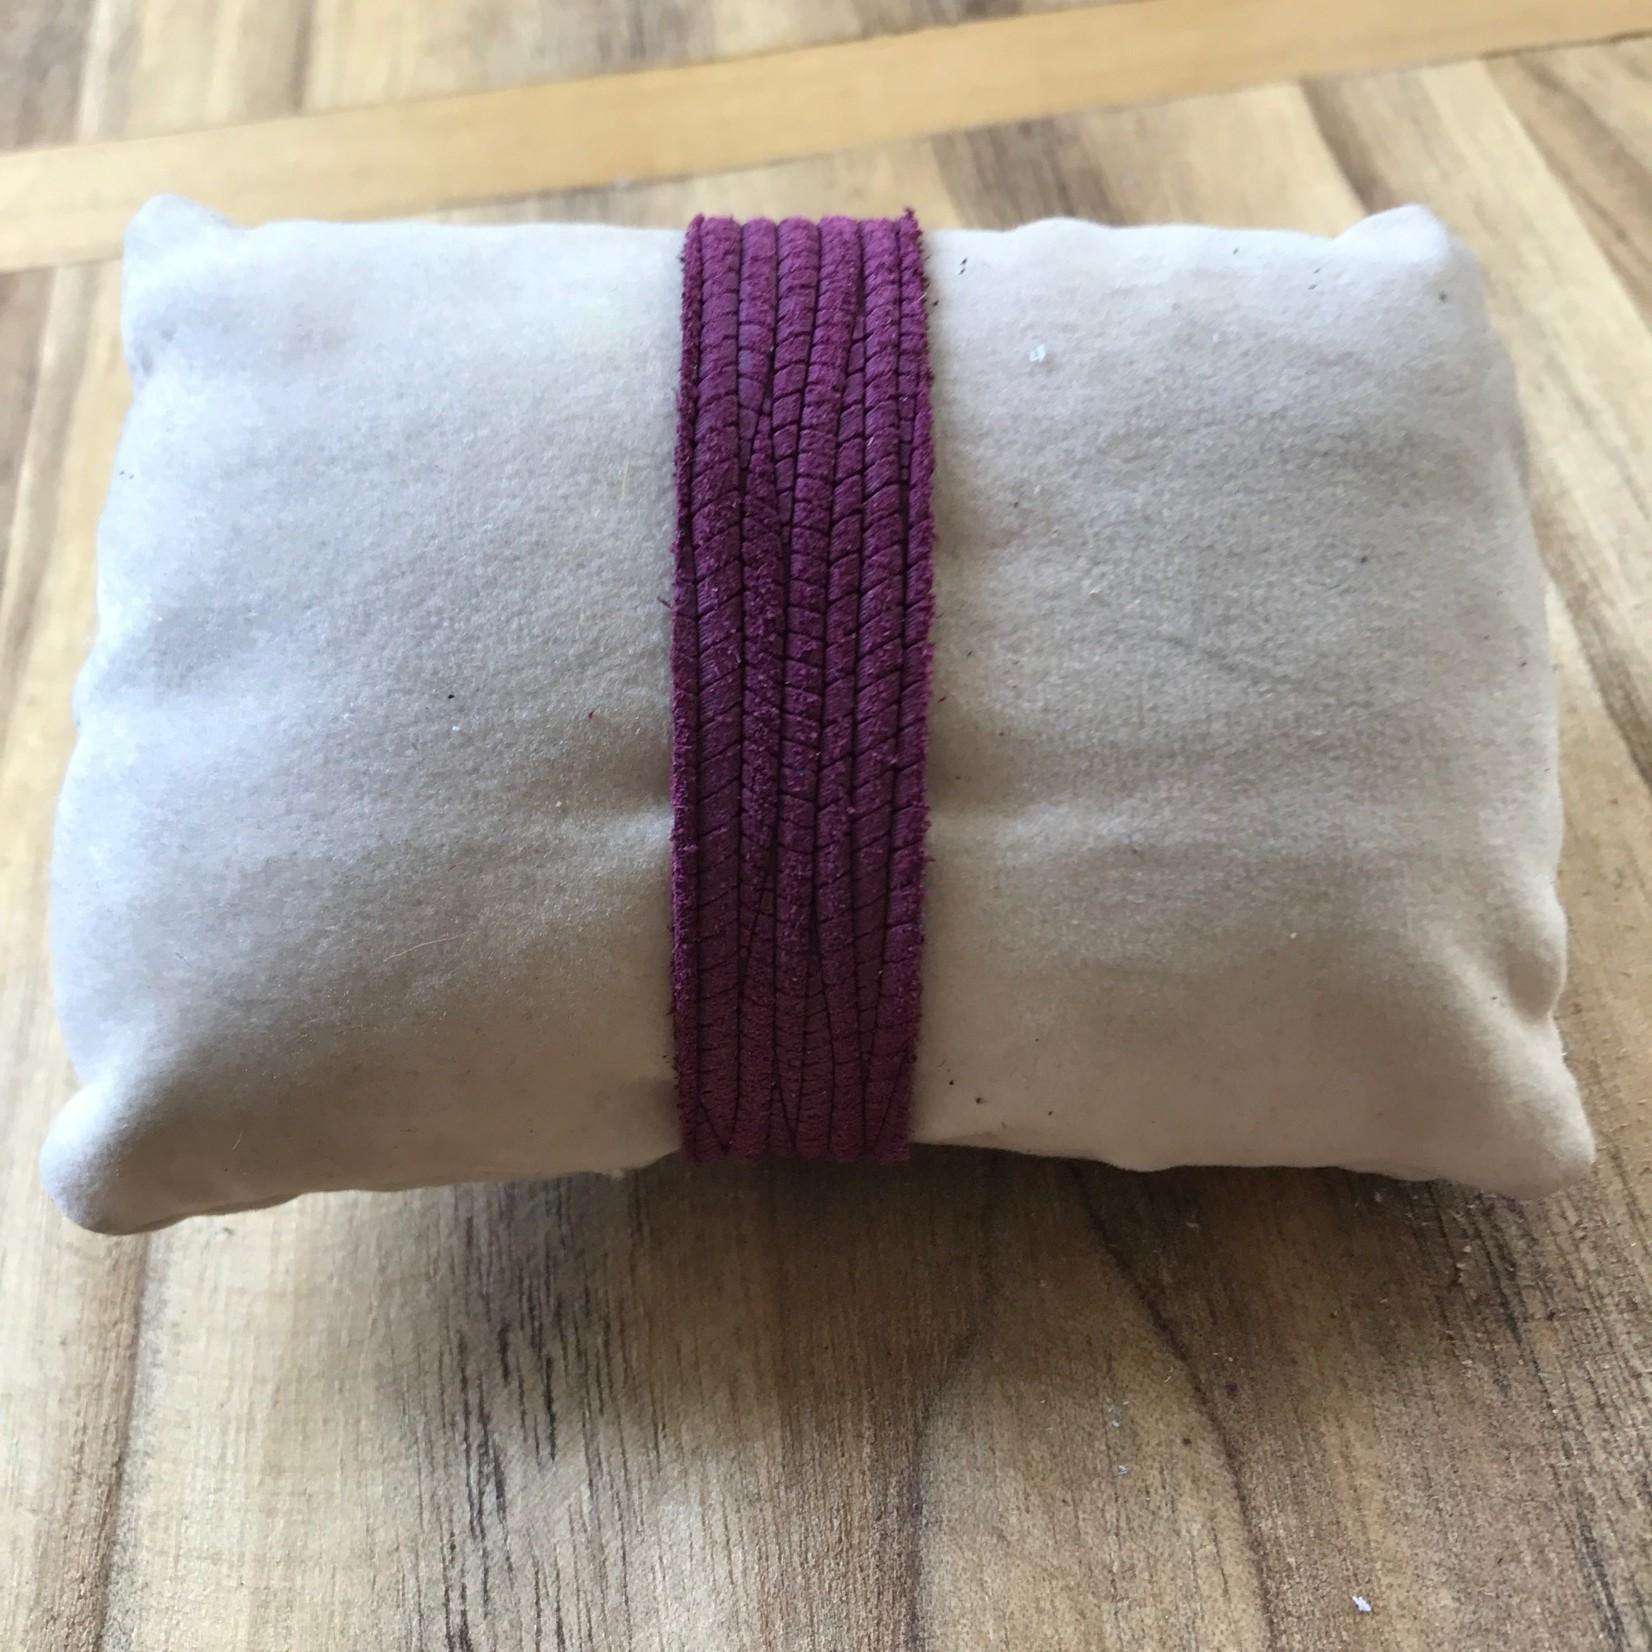 molliPOPdesign molliPOPdesign Palm Texture Skinny Cuff Bracelet